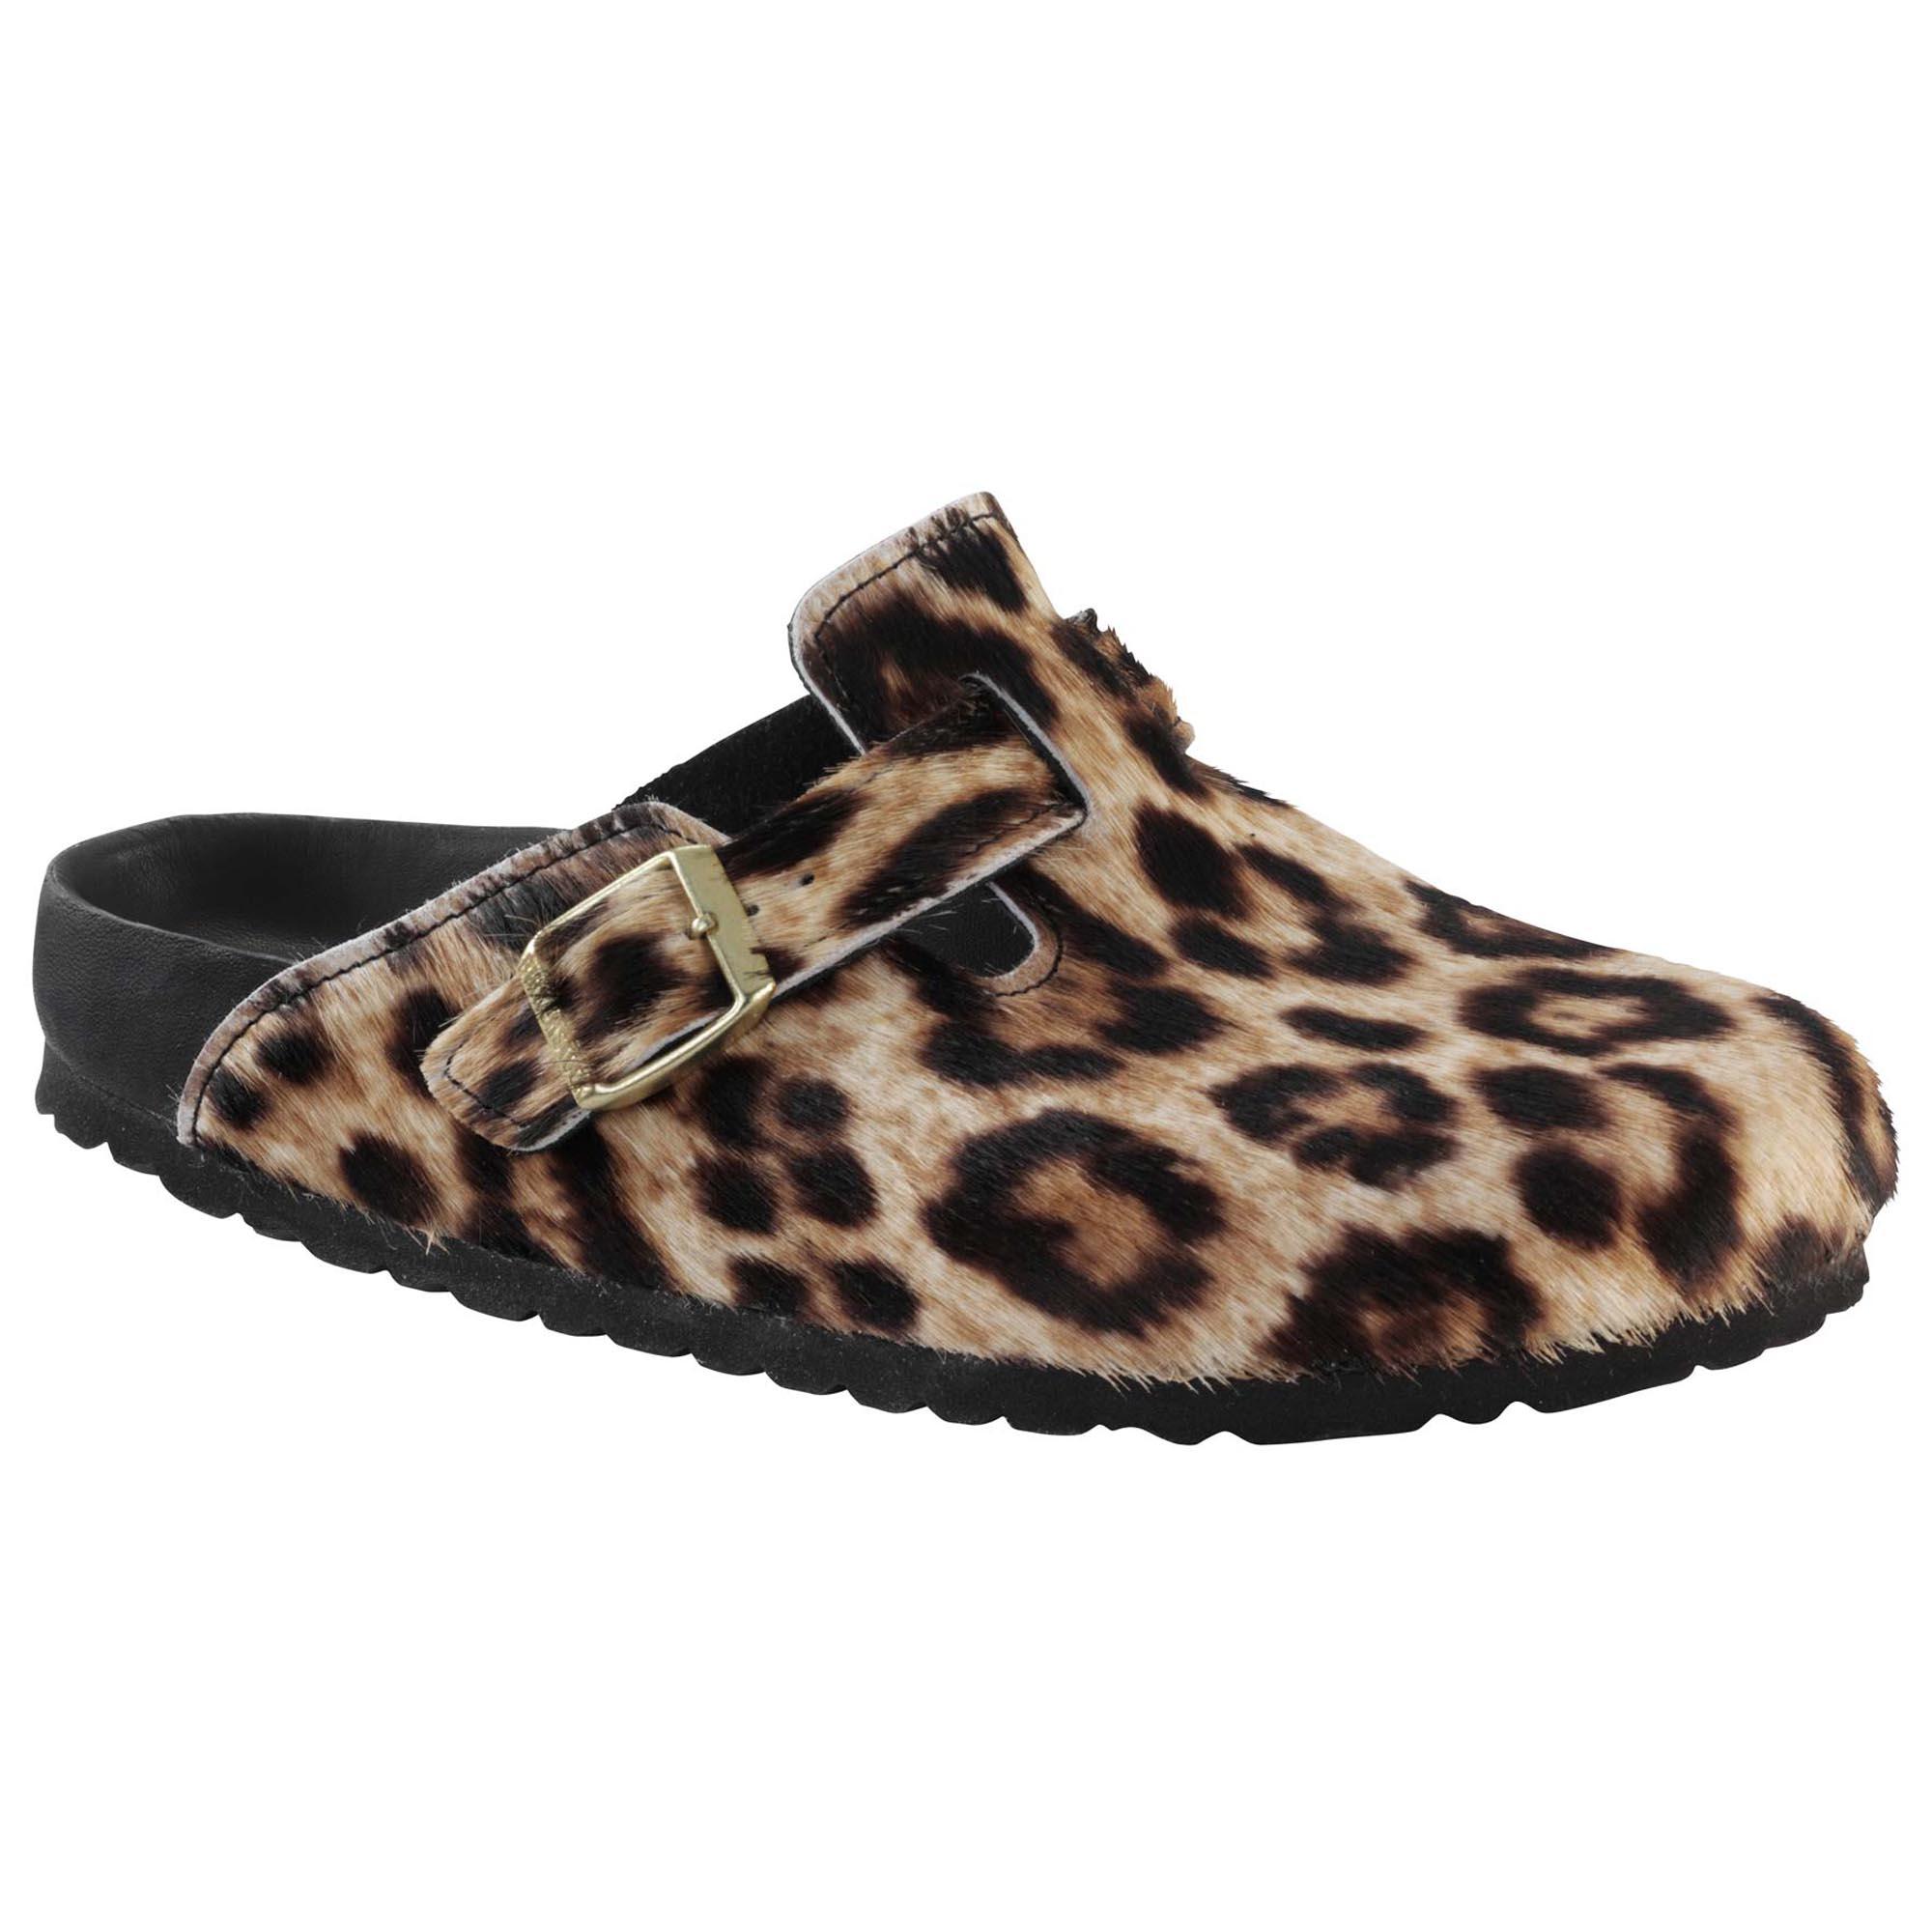 a9b87298ce2 Boston Fur Snow Leopard